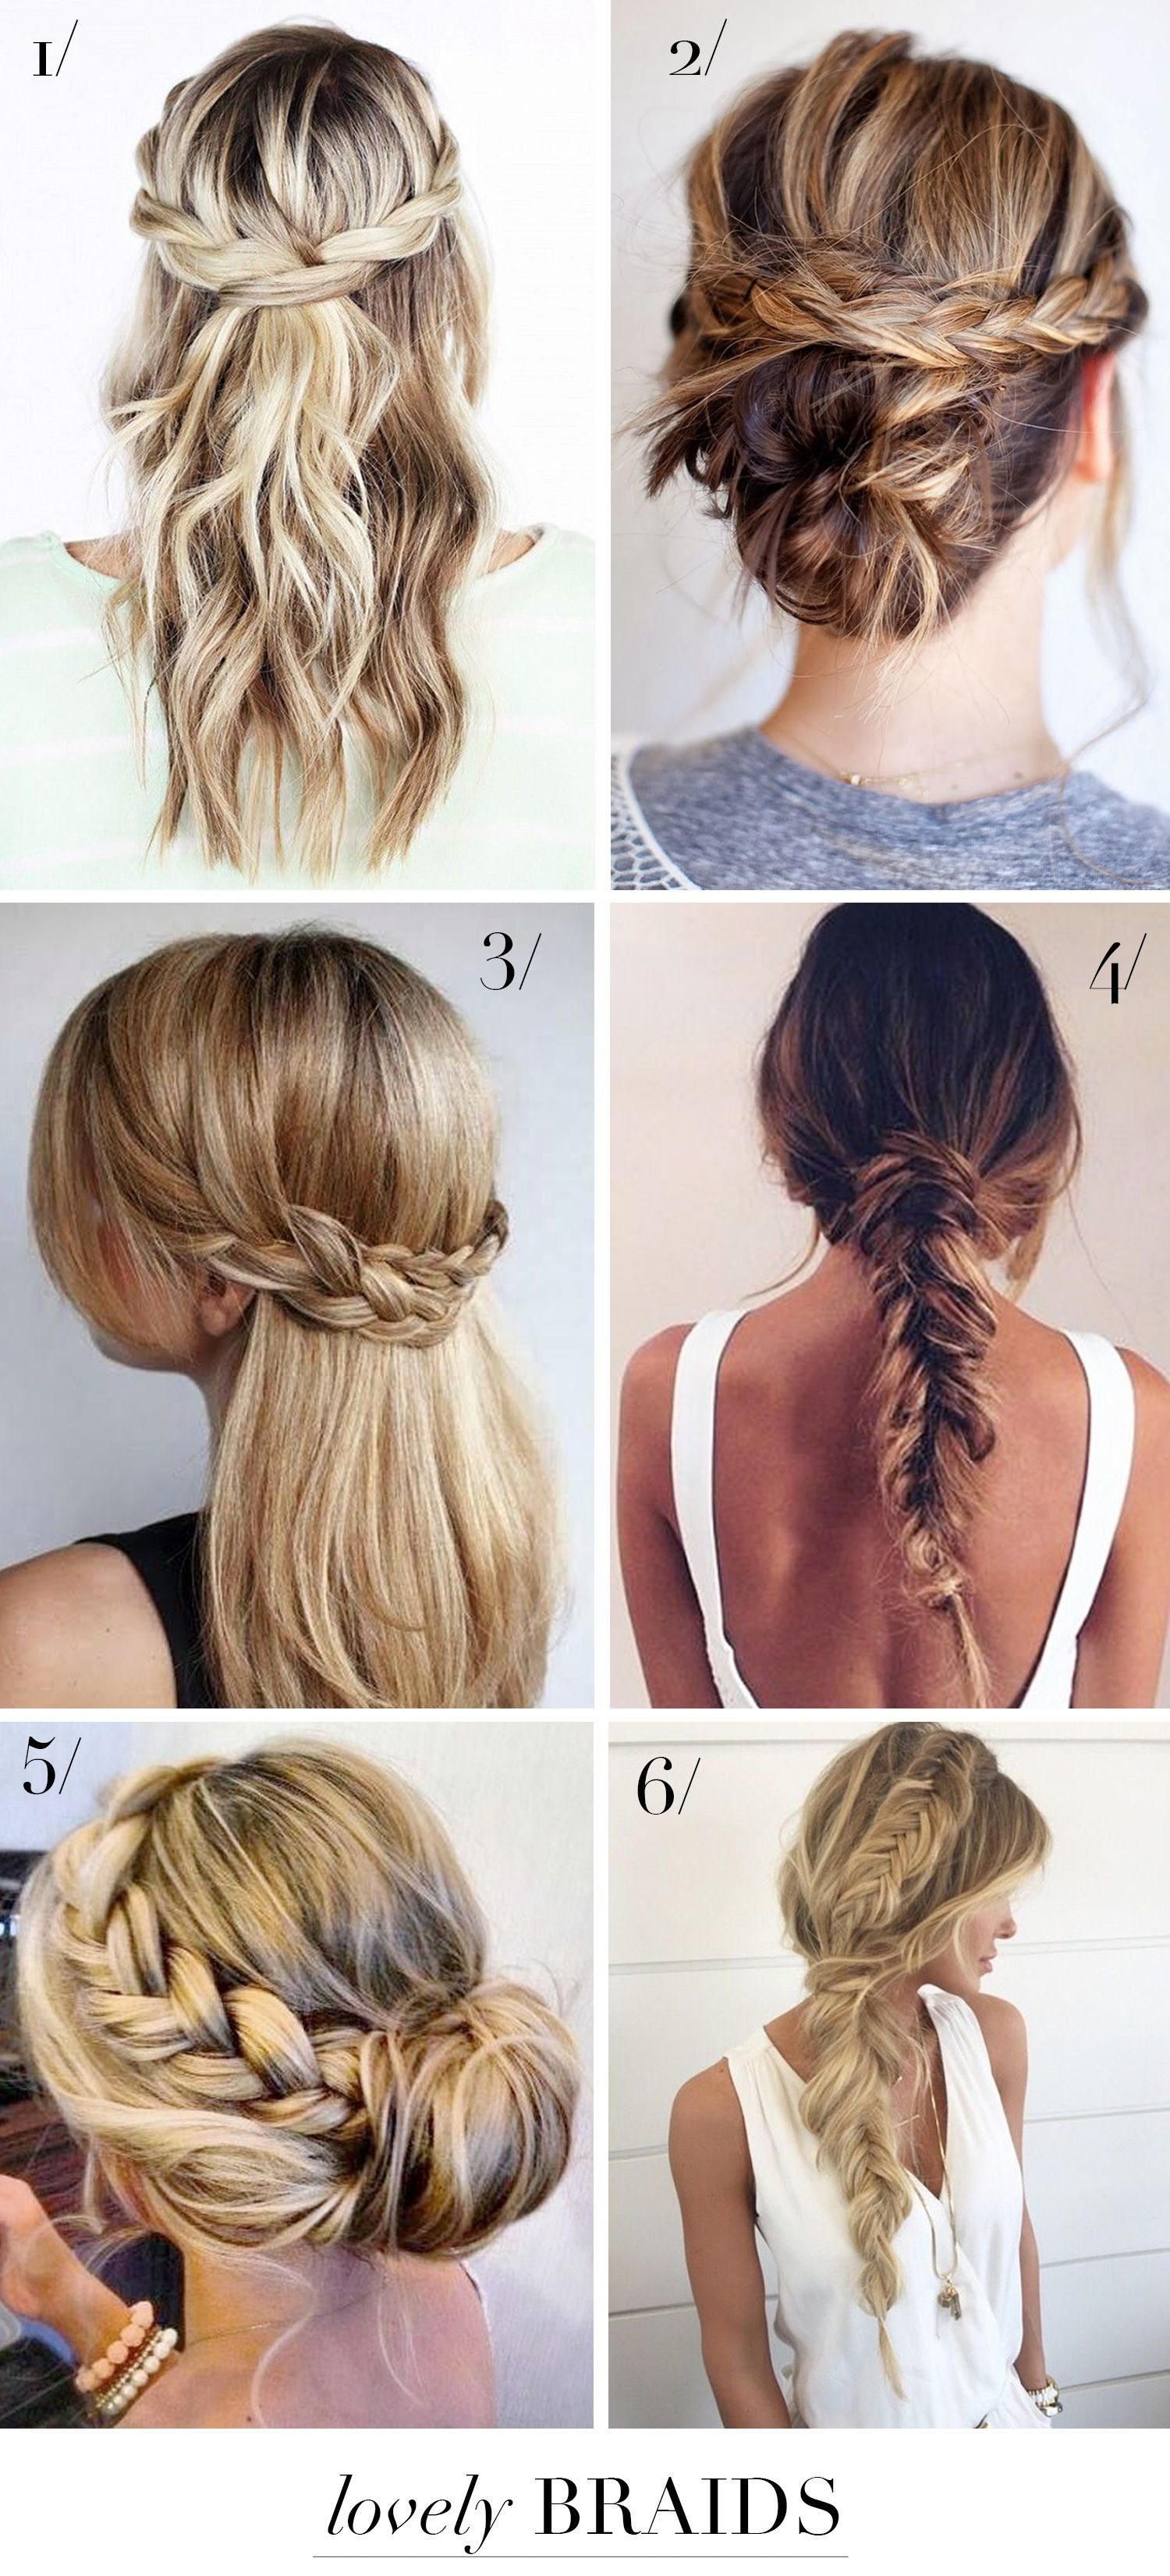 6 lovely braids